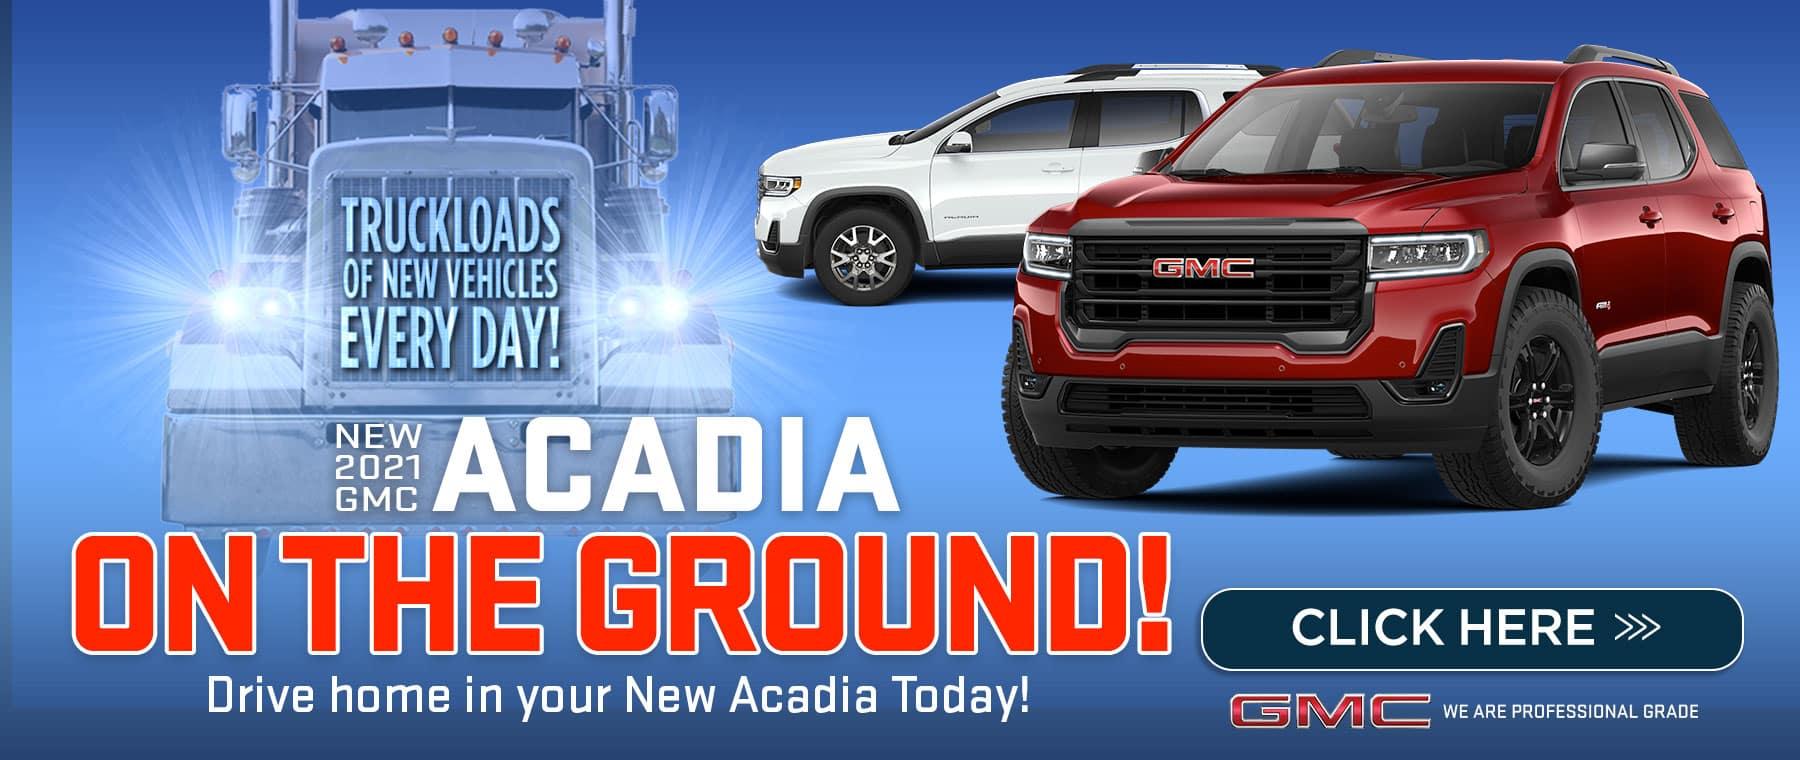 New 2021 GMC Acadia - On the ground